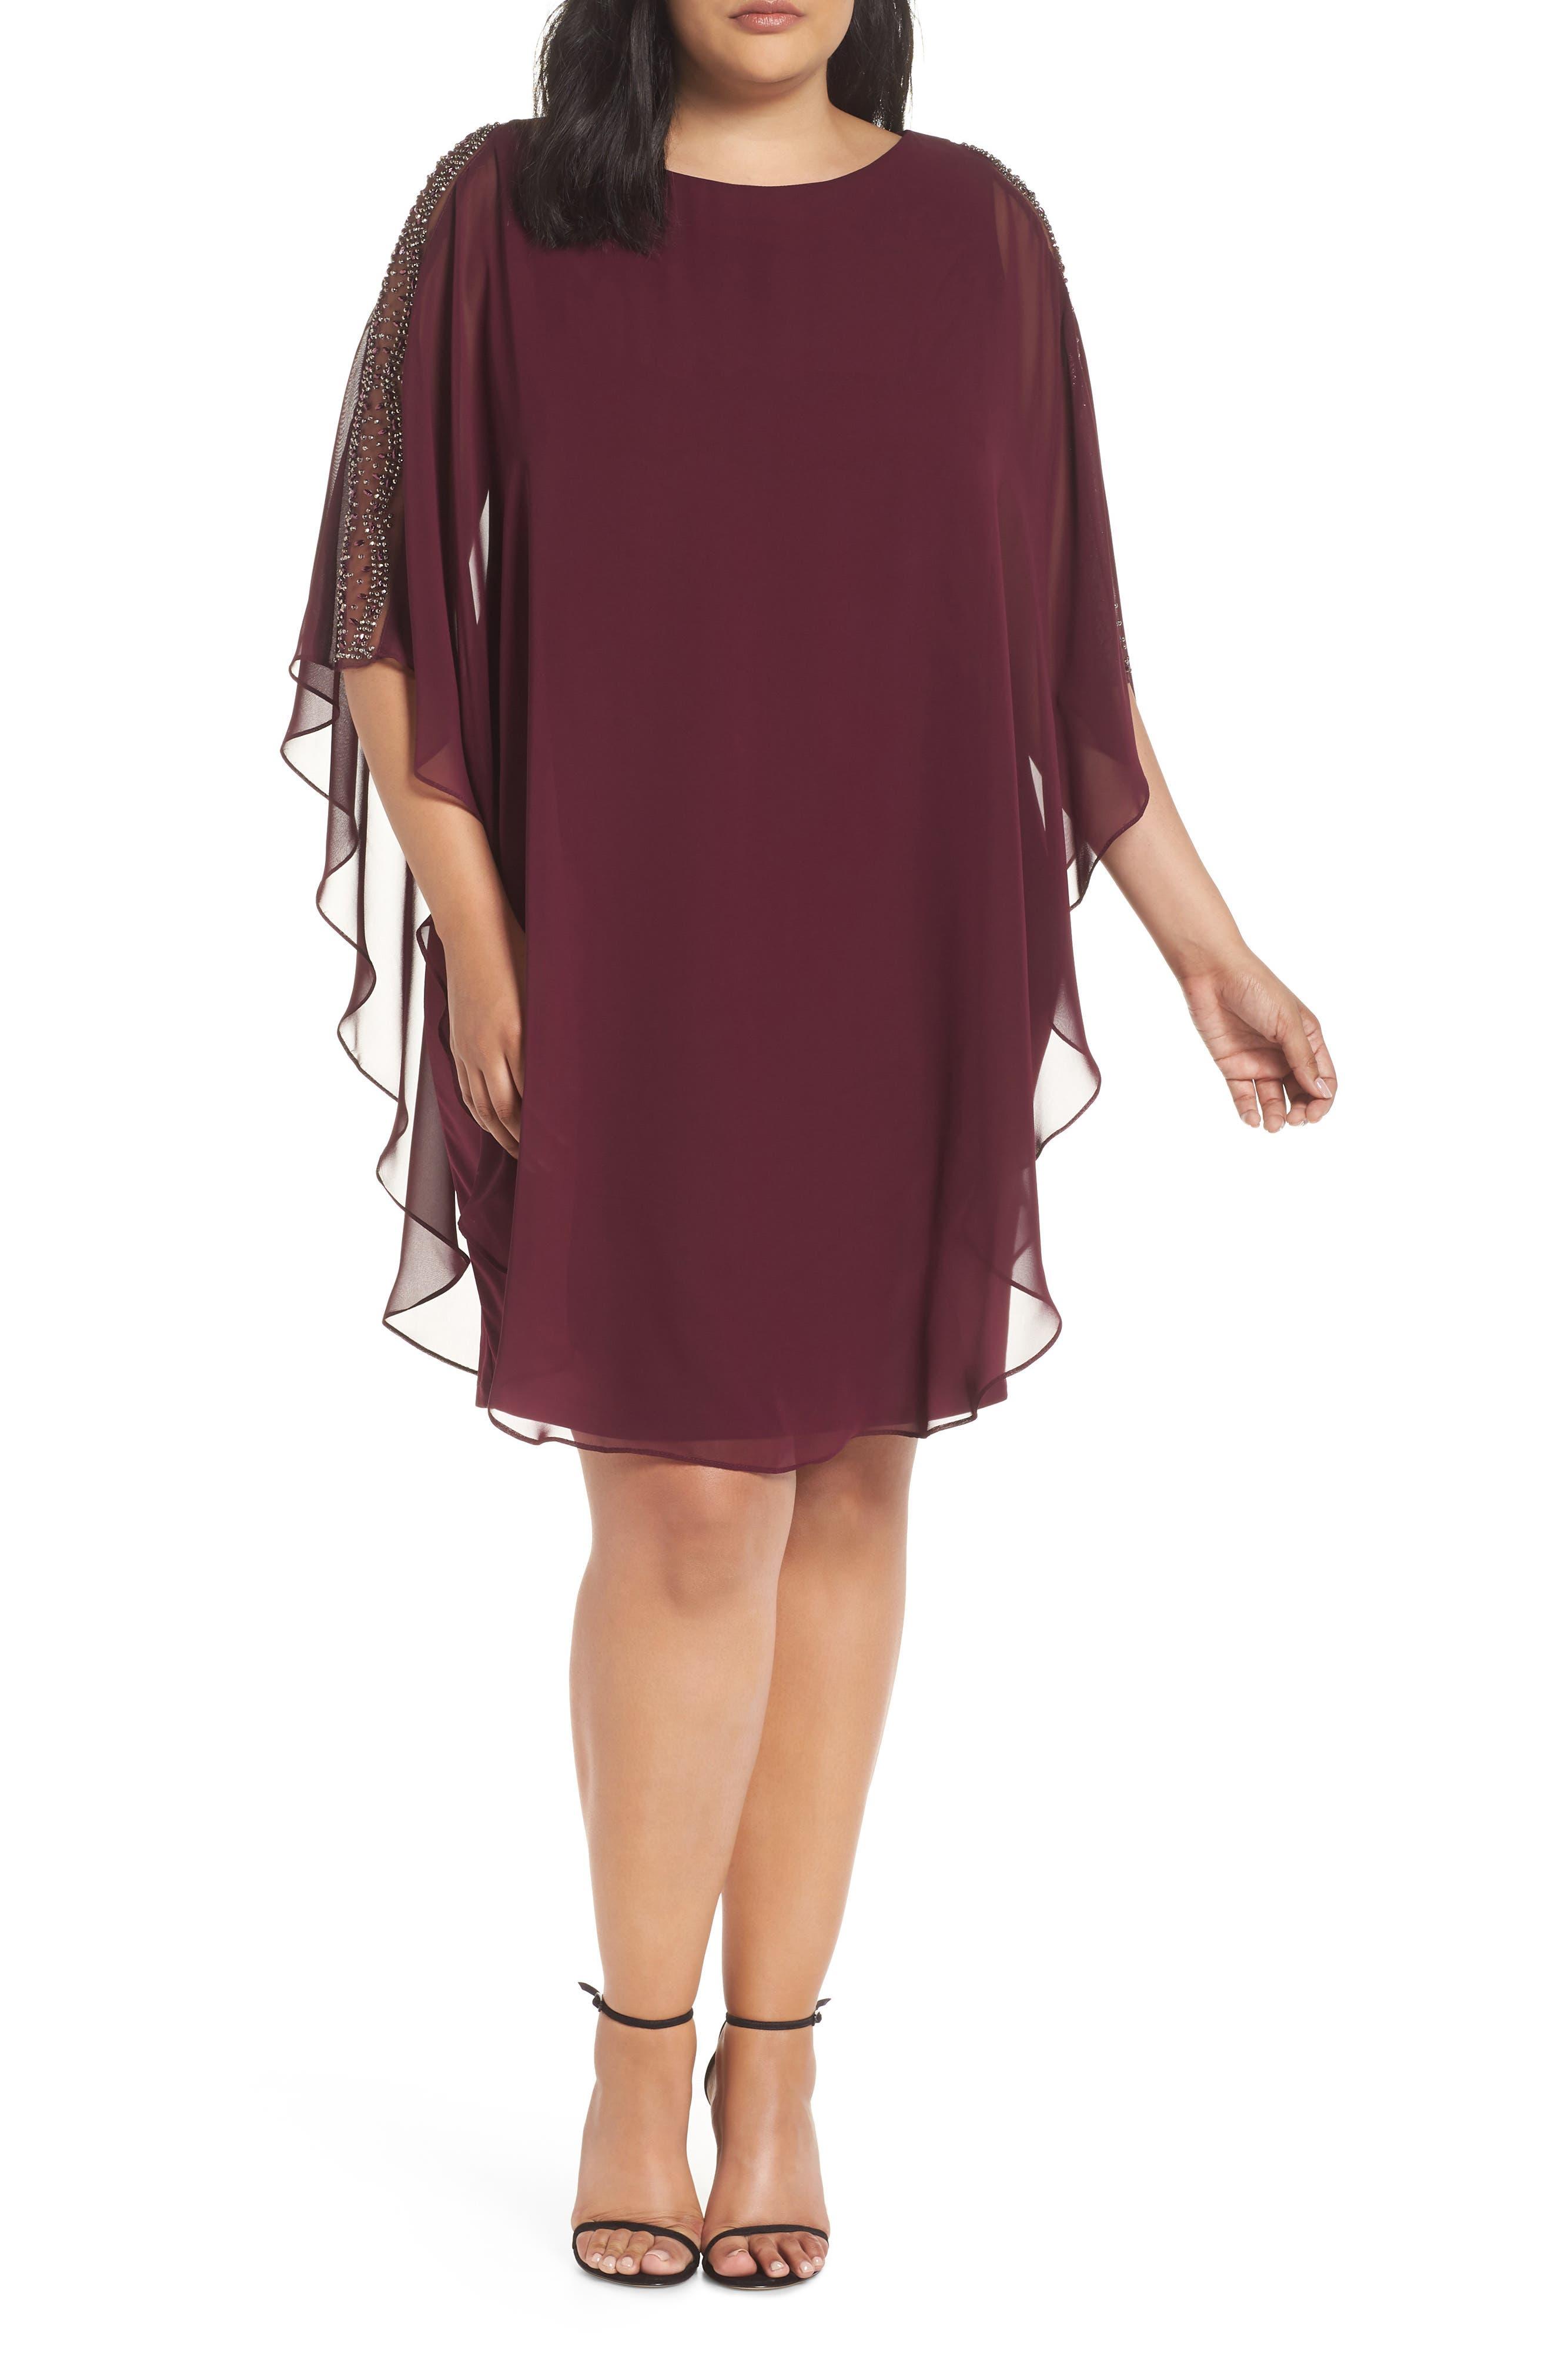 Chiffon Overlay Beaded Sleeve Cocktail Dress,                         Main,                         color, WINE